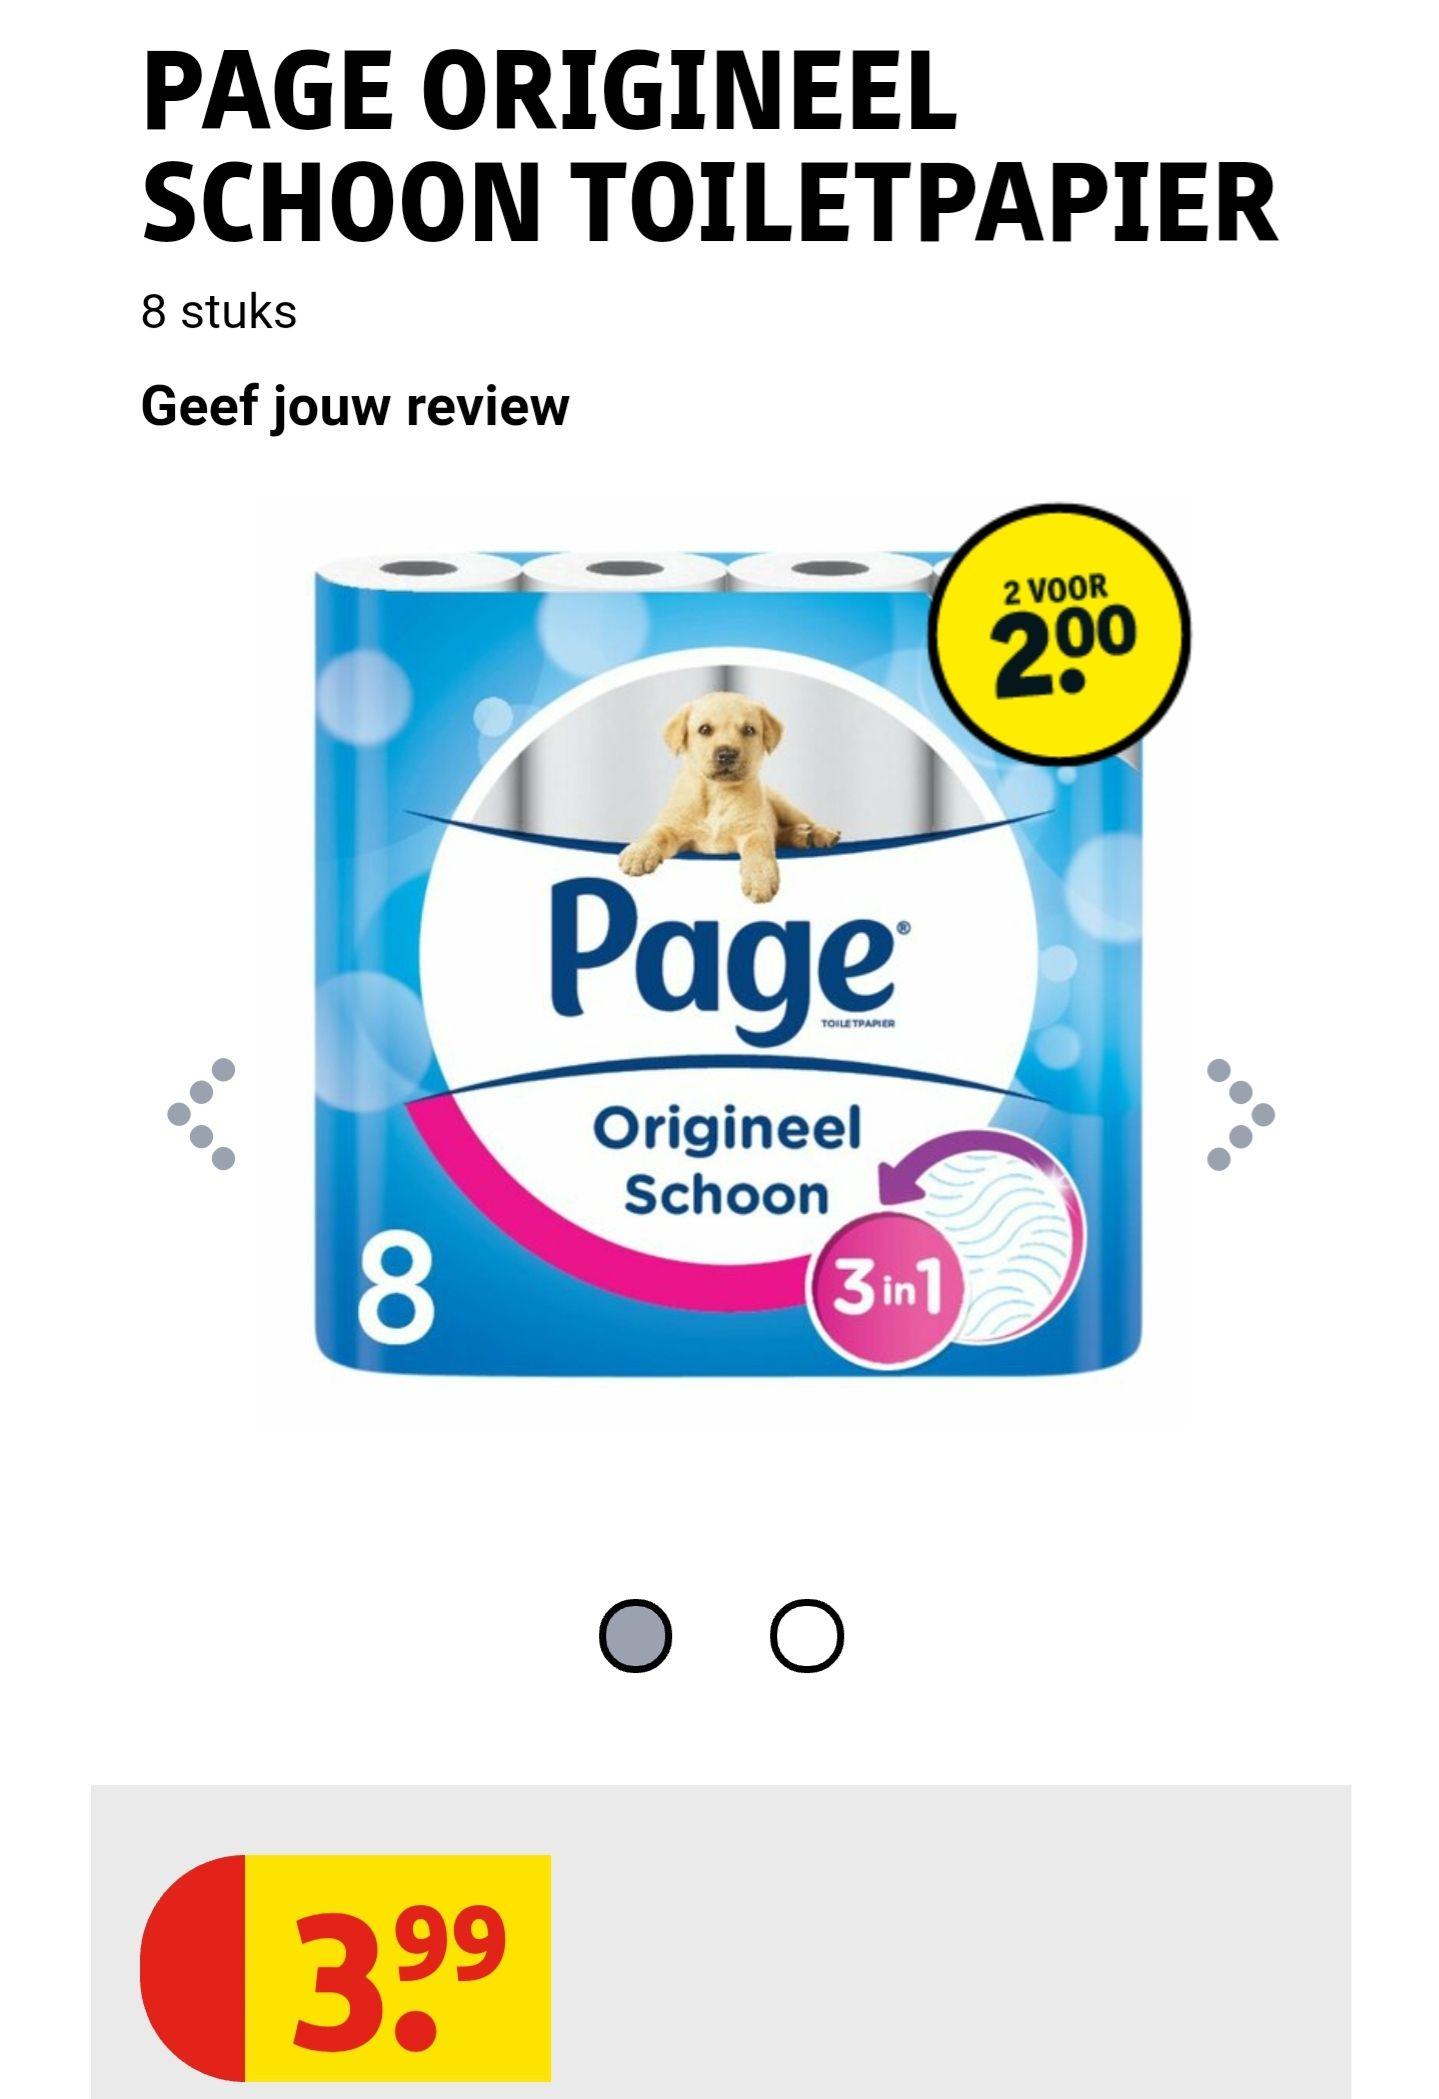 Kruidvat: Page 8 rollen toiletpapier nu 2 à 8 rollen voor 2 euro